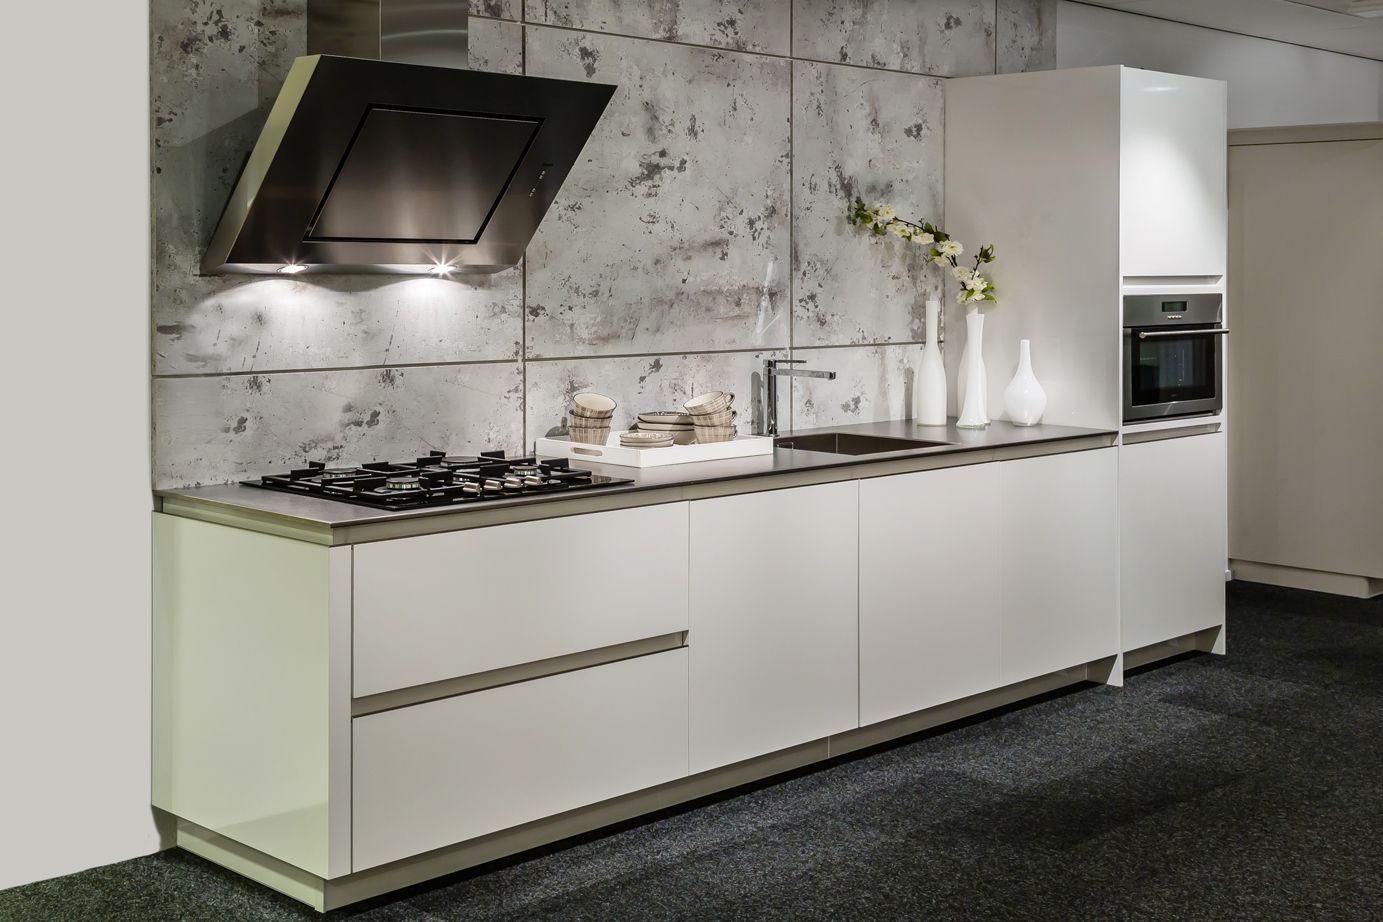 Moderne design keuken met rvs aanrechtblad db keukens witte keukens pinterest - Kleine keuken amerikaanse keuken ...